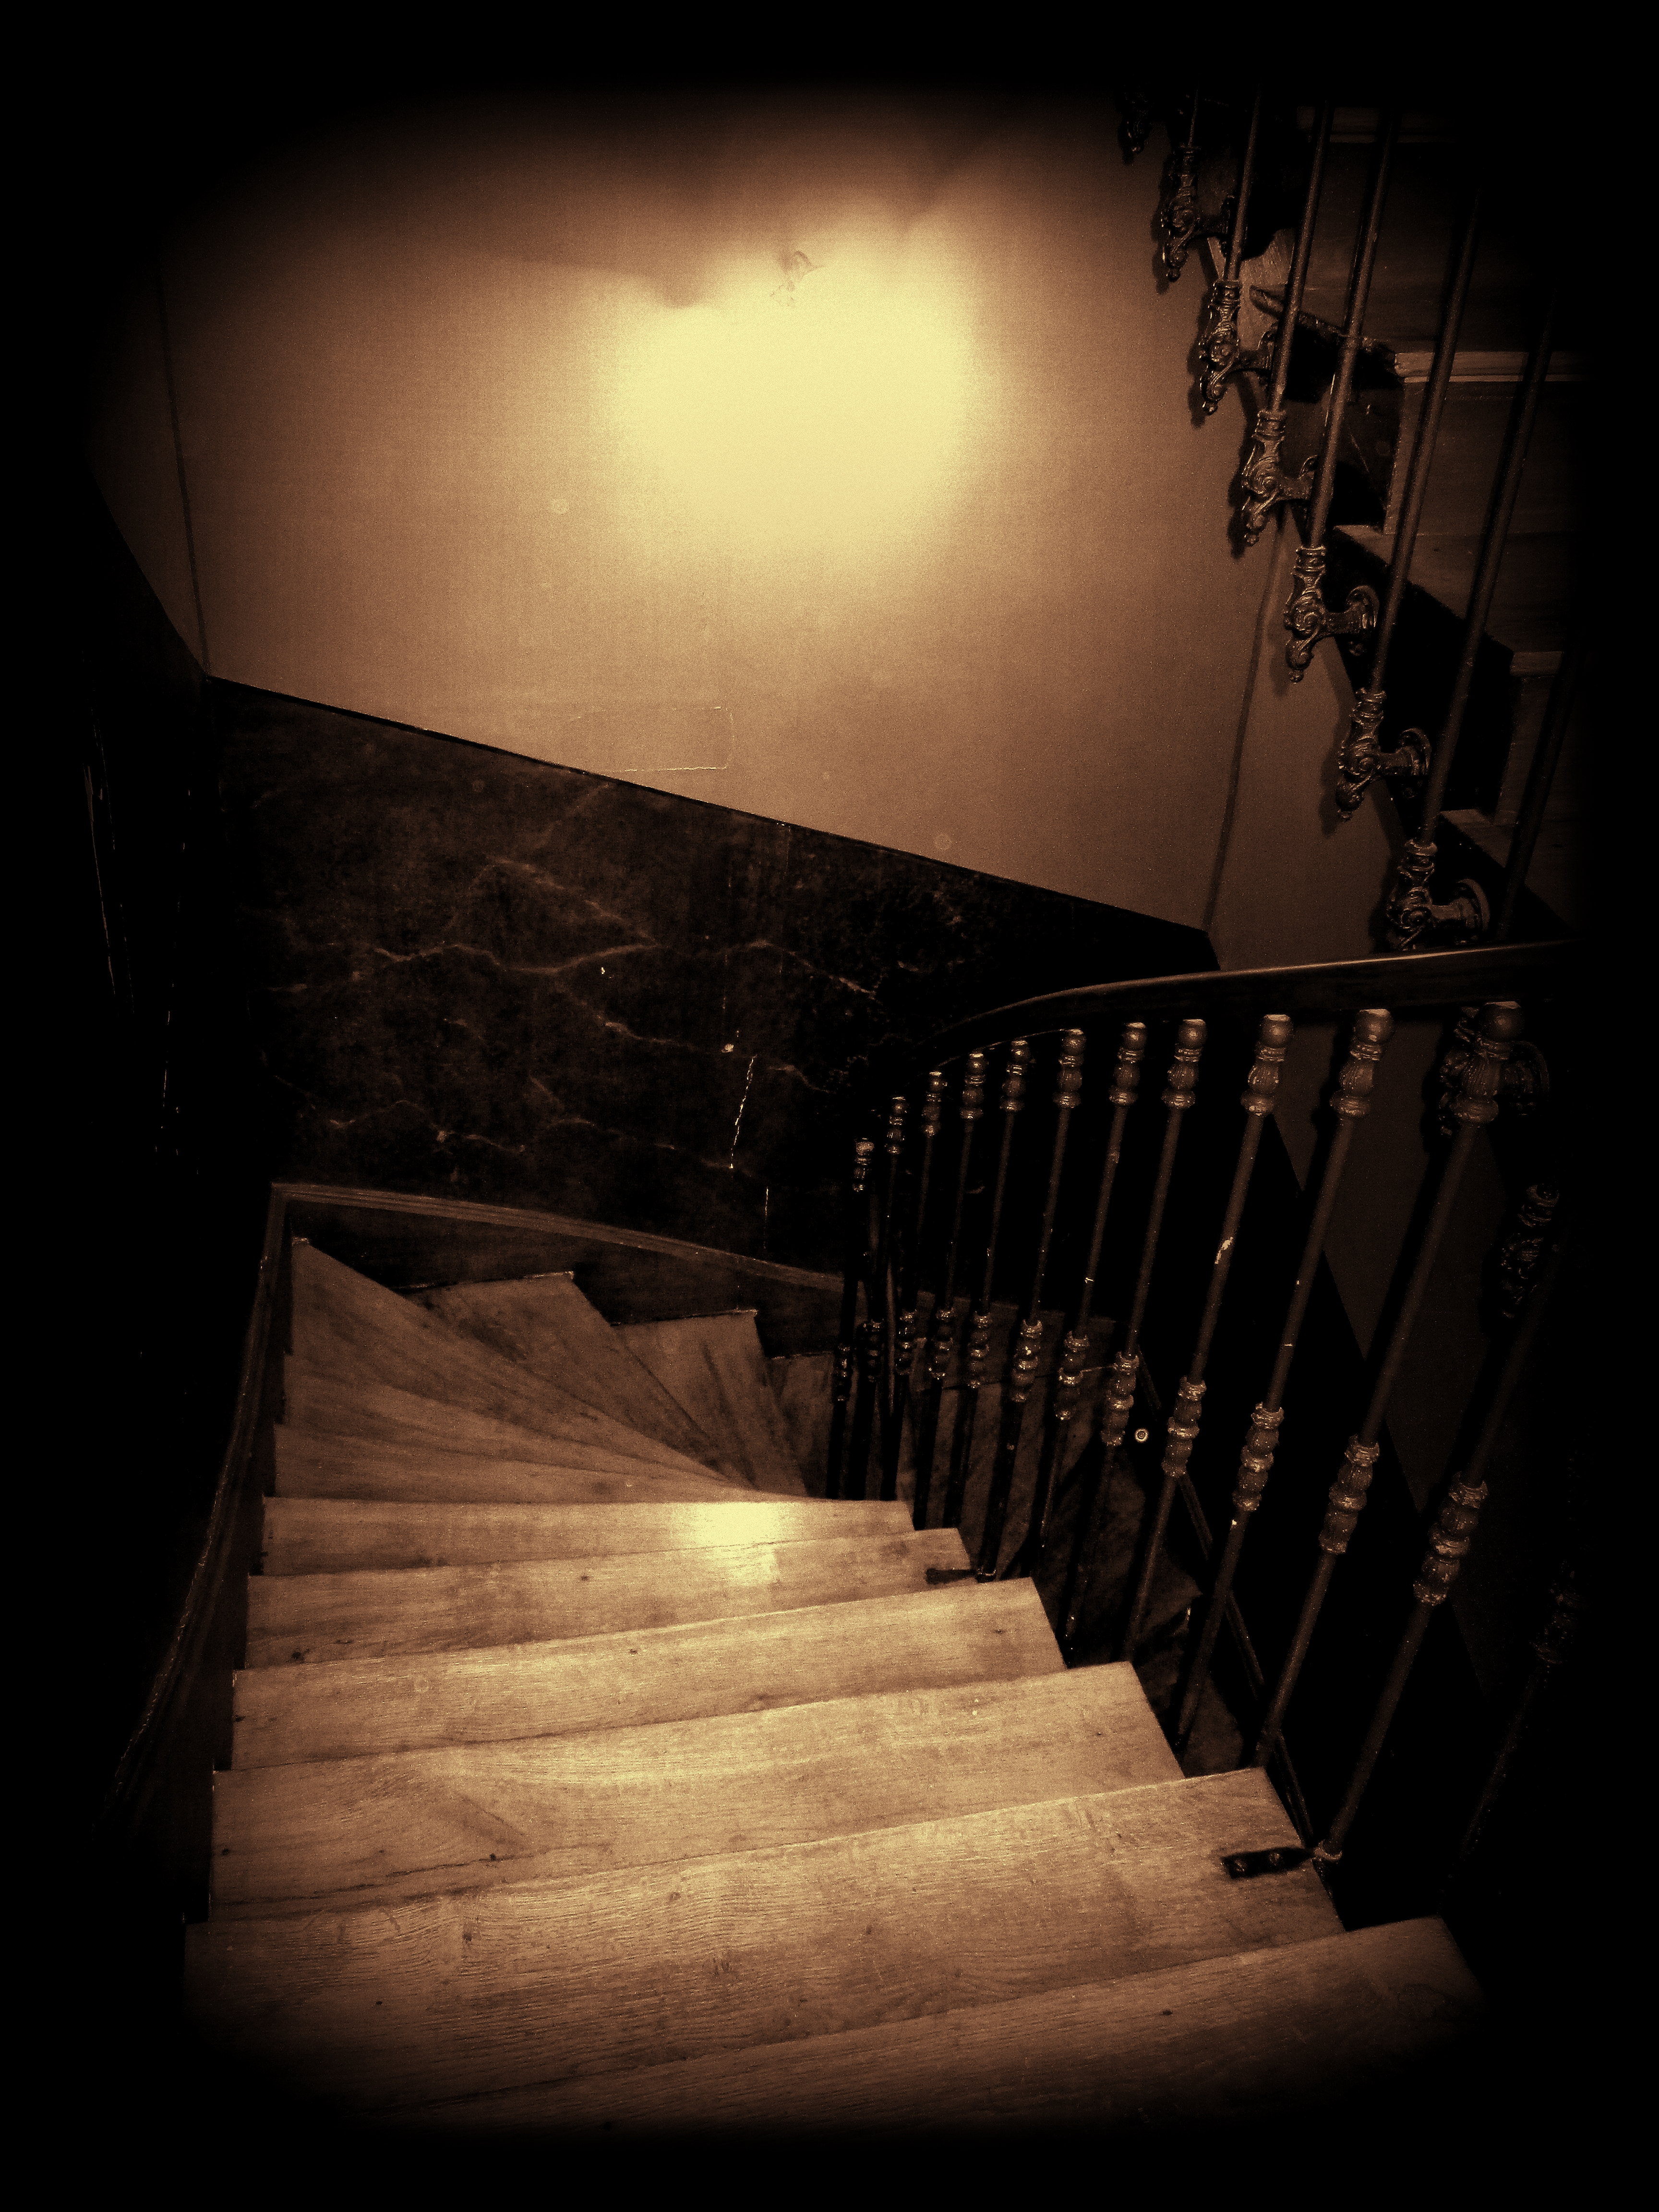 The impossible escape for Jean Moulin, Black background, Night, Photo border, Serene, HQ Photo